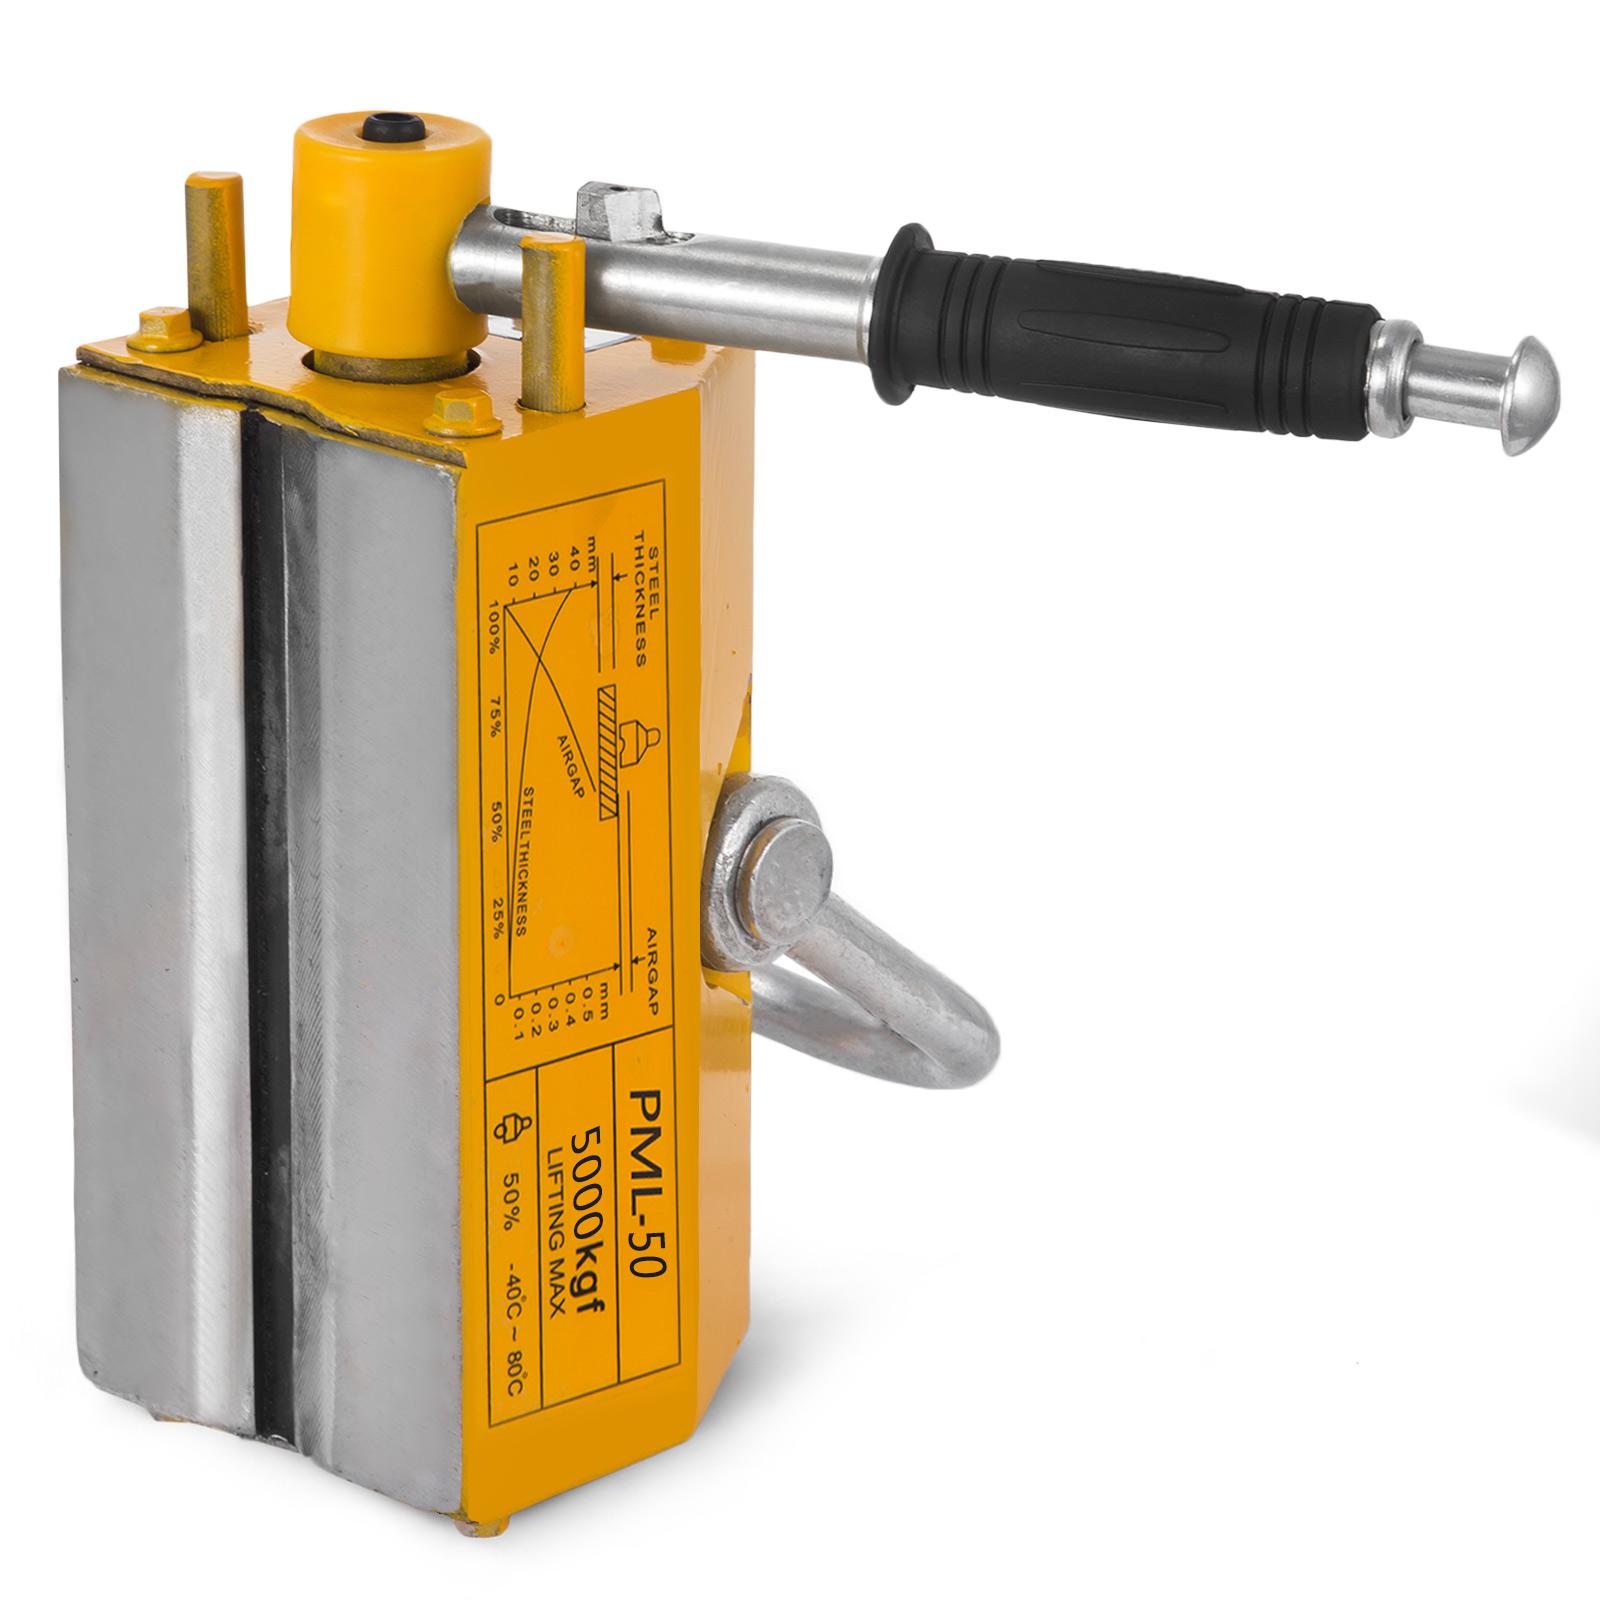 100-300-600-1000KG-Steel-Magnetic-Lifter-Heavy-Duty-Crane-Hoist-Lifting-Magnet miniature 115